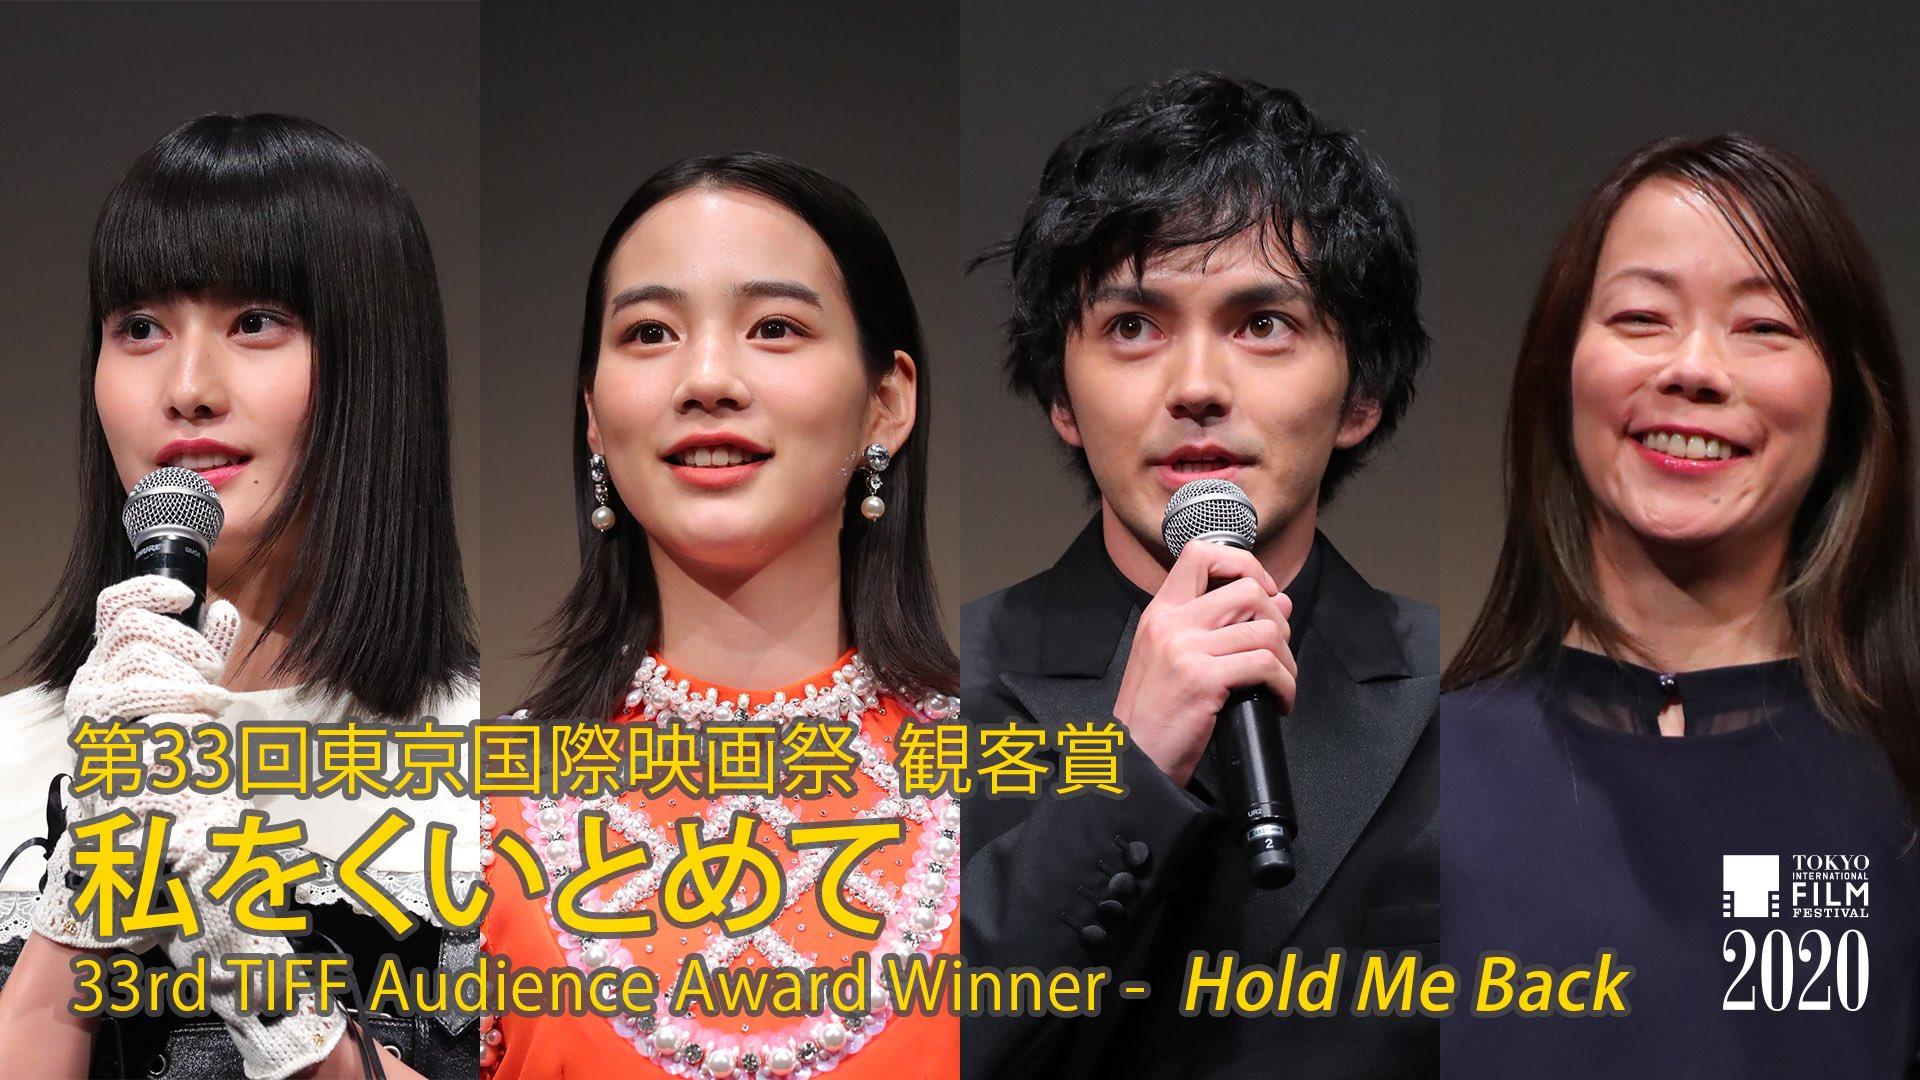 Watashi o Kuitomete (Hold Me Back) film - Akiko Ohku - 33 TIFFJP